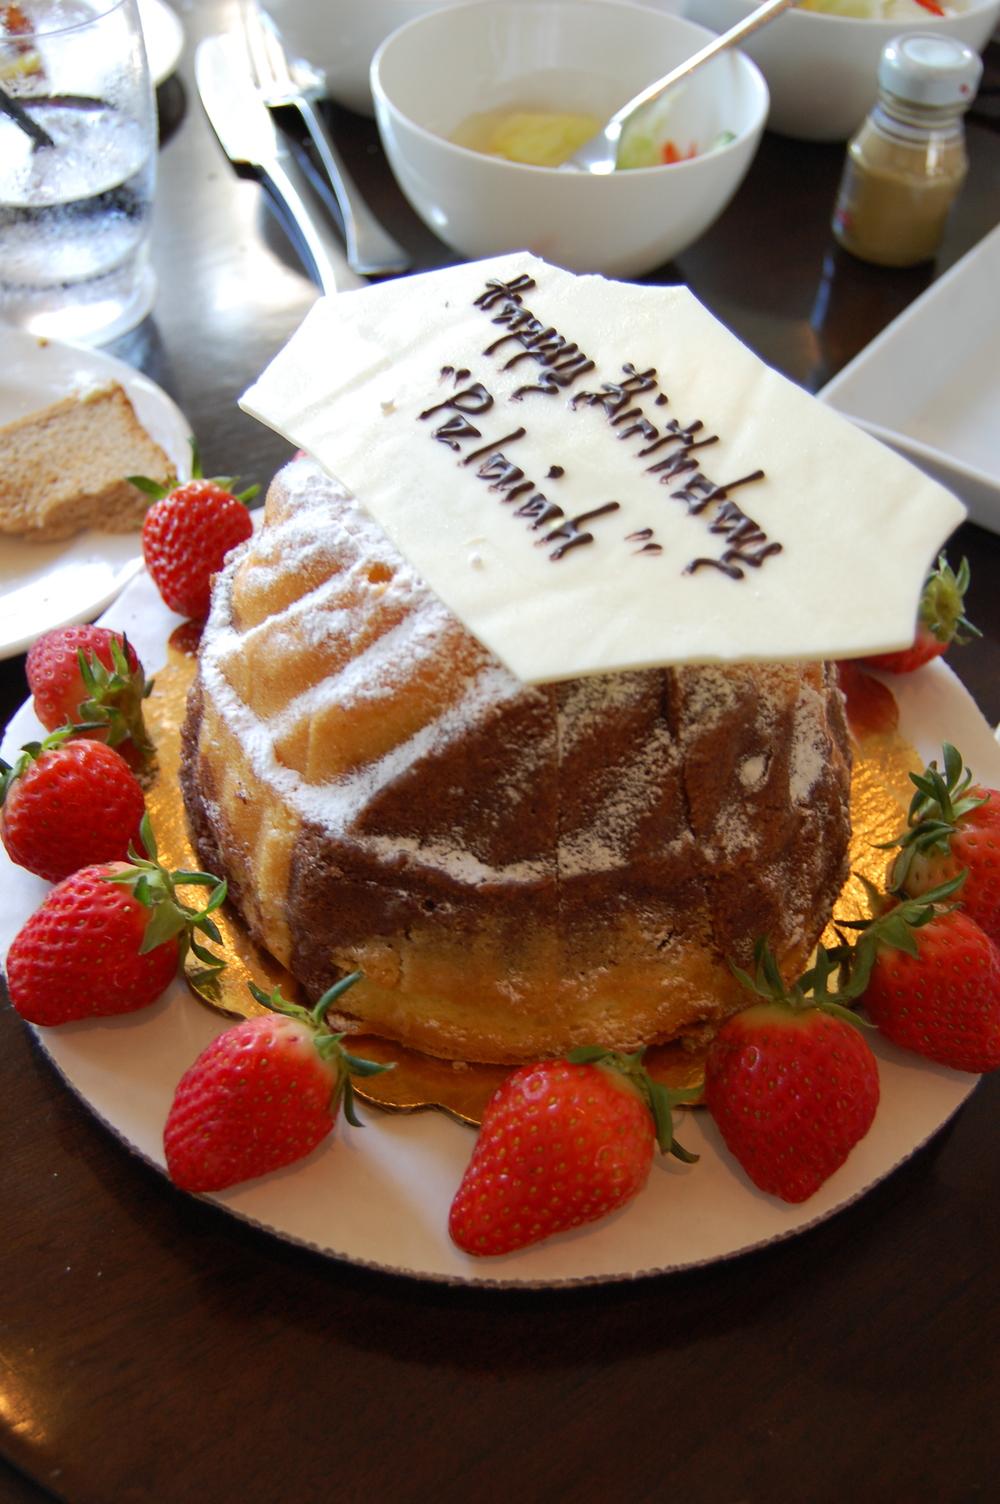 DSC_0189 - Pelaiah's surpsie birthday cake.JPG